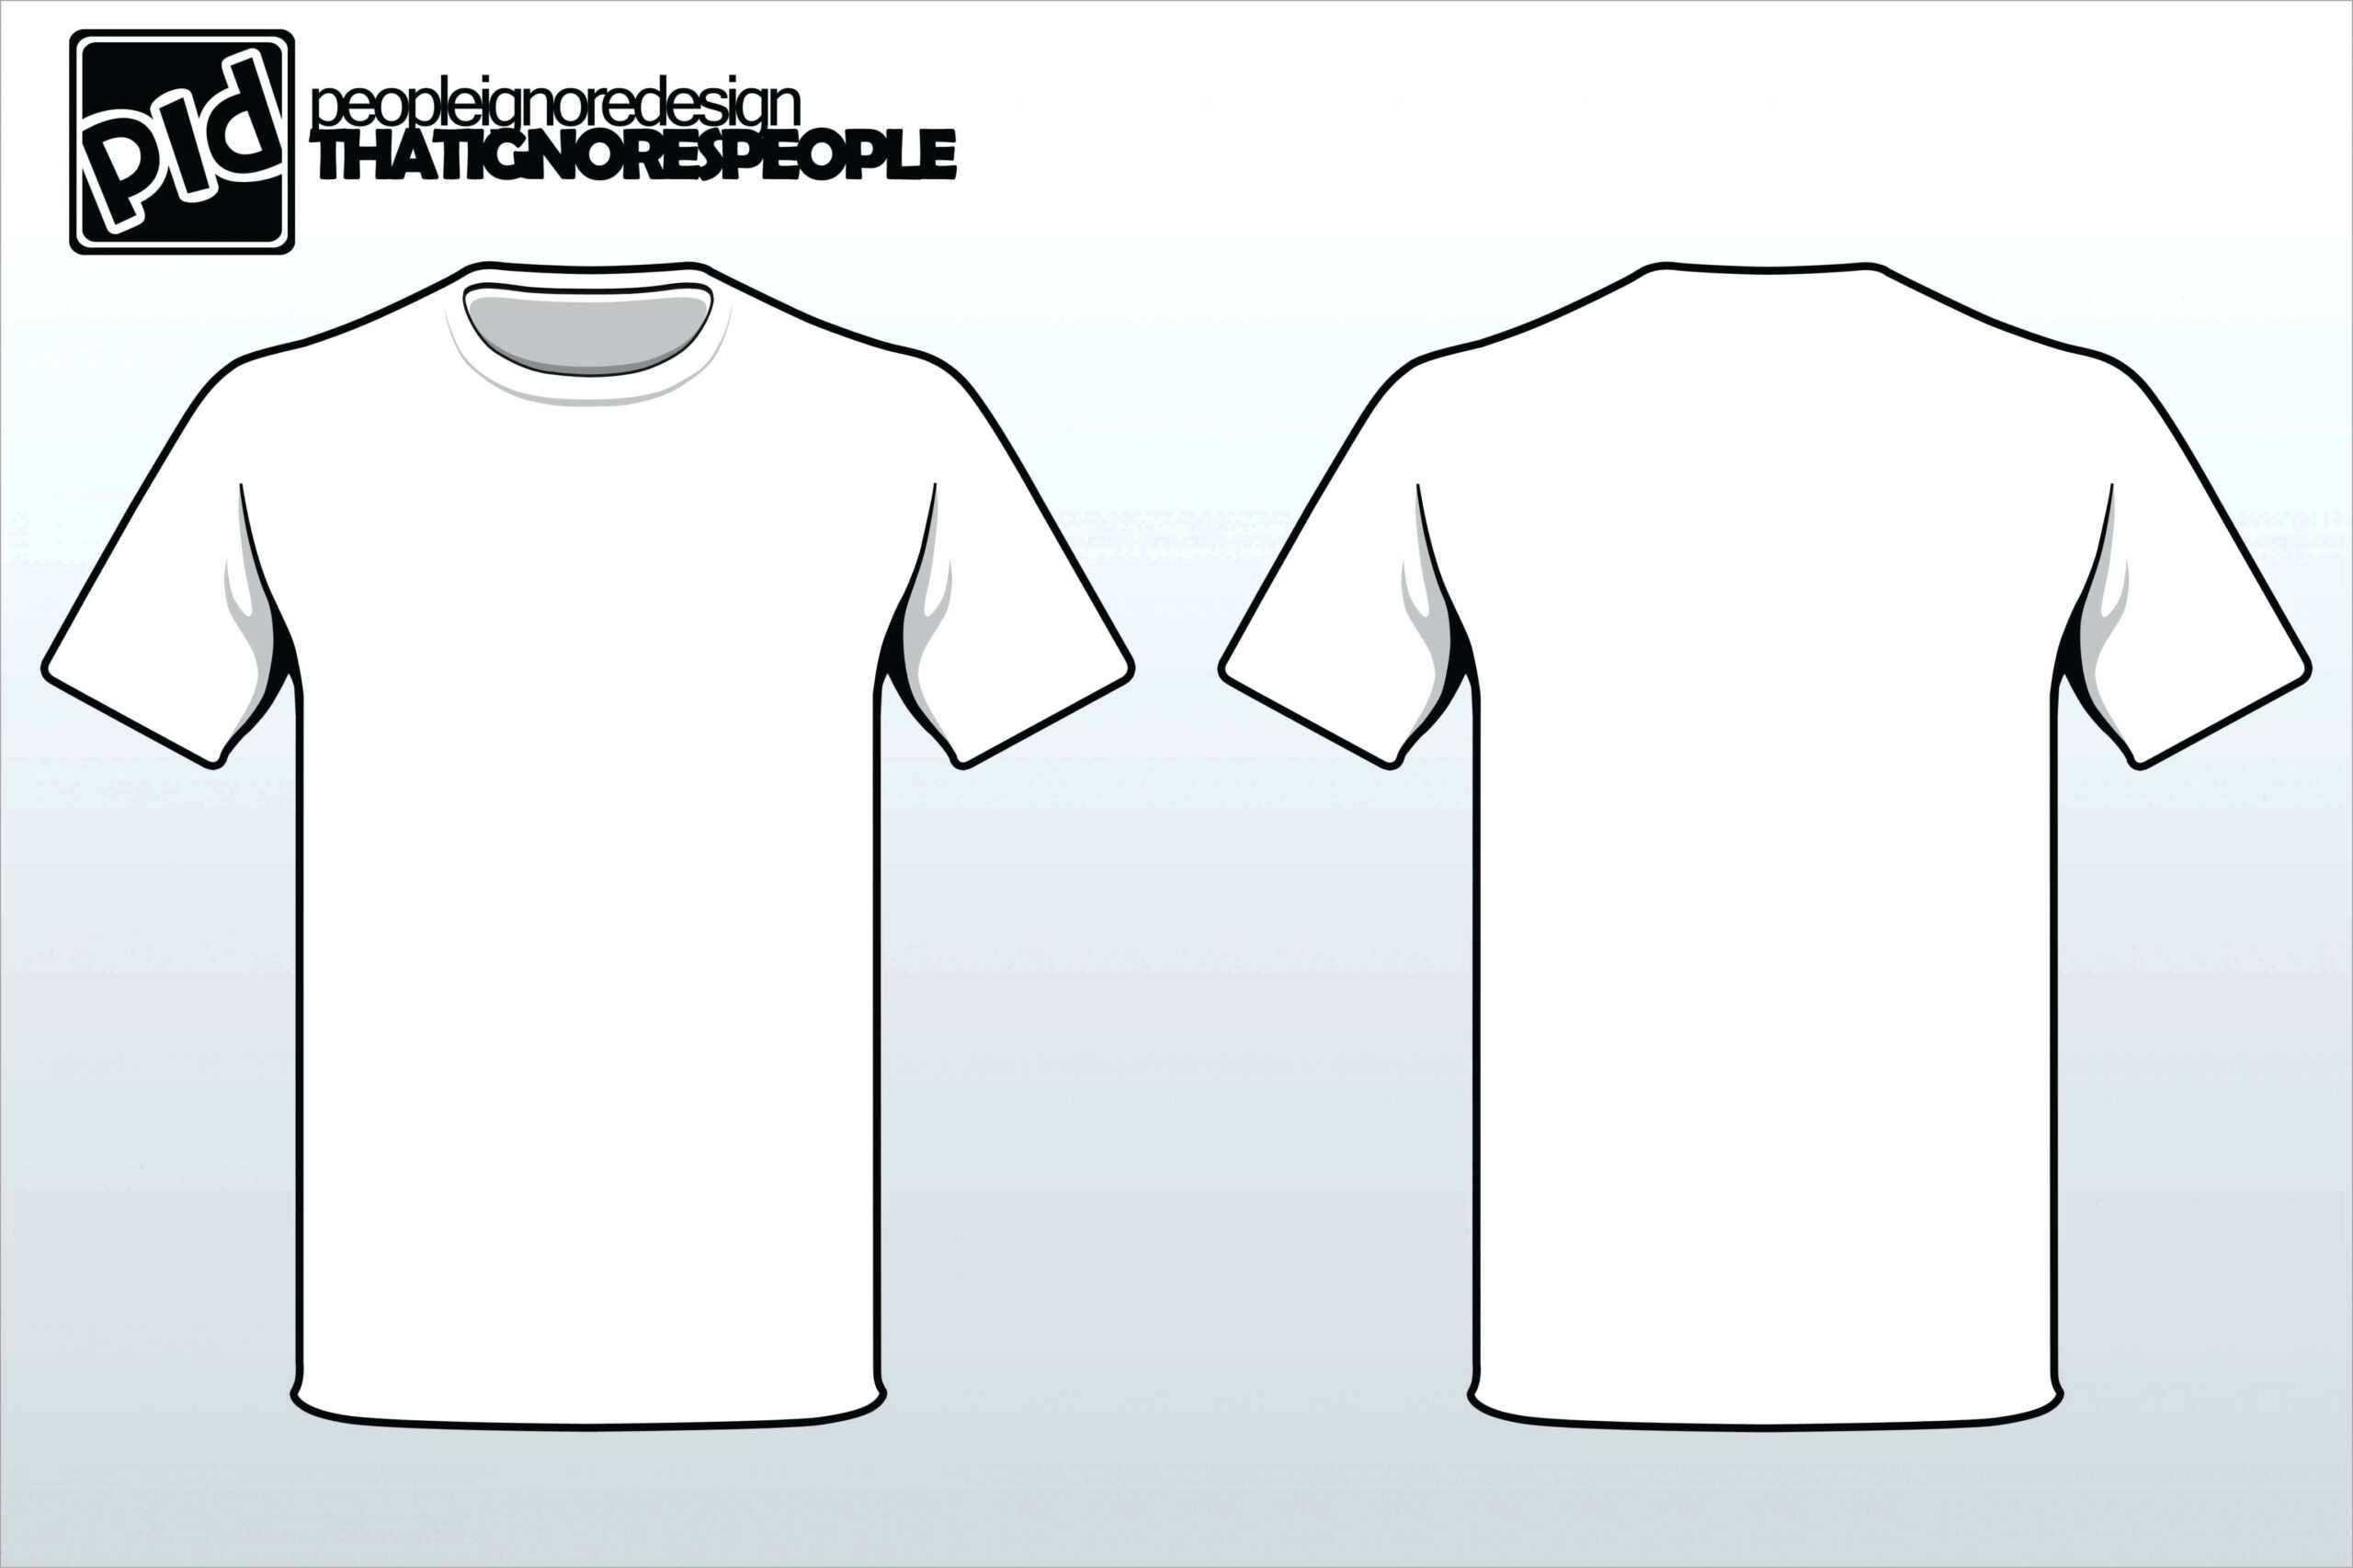 037 T Shirt Design Template Free Download Beautiful Printing with Blank T Shirt Design Template Psd